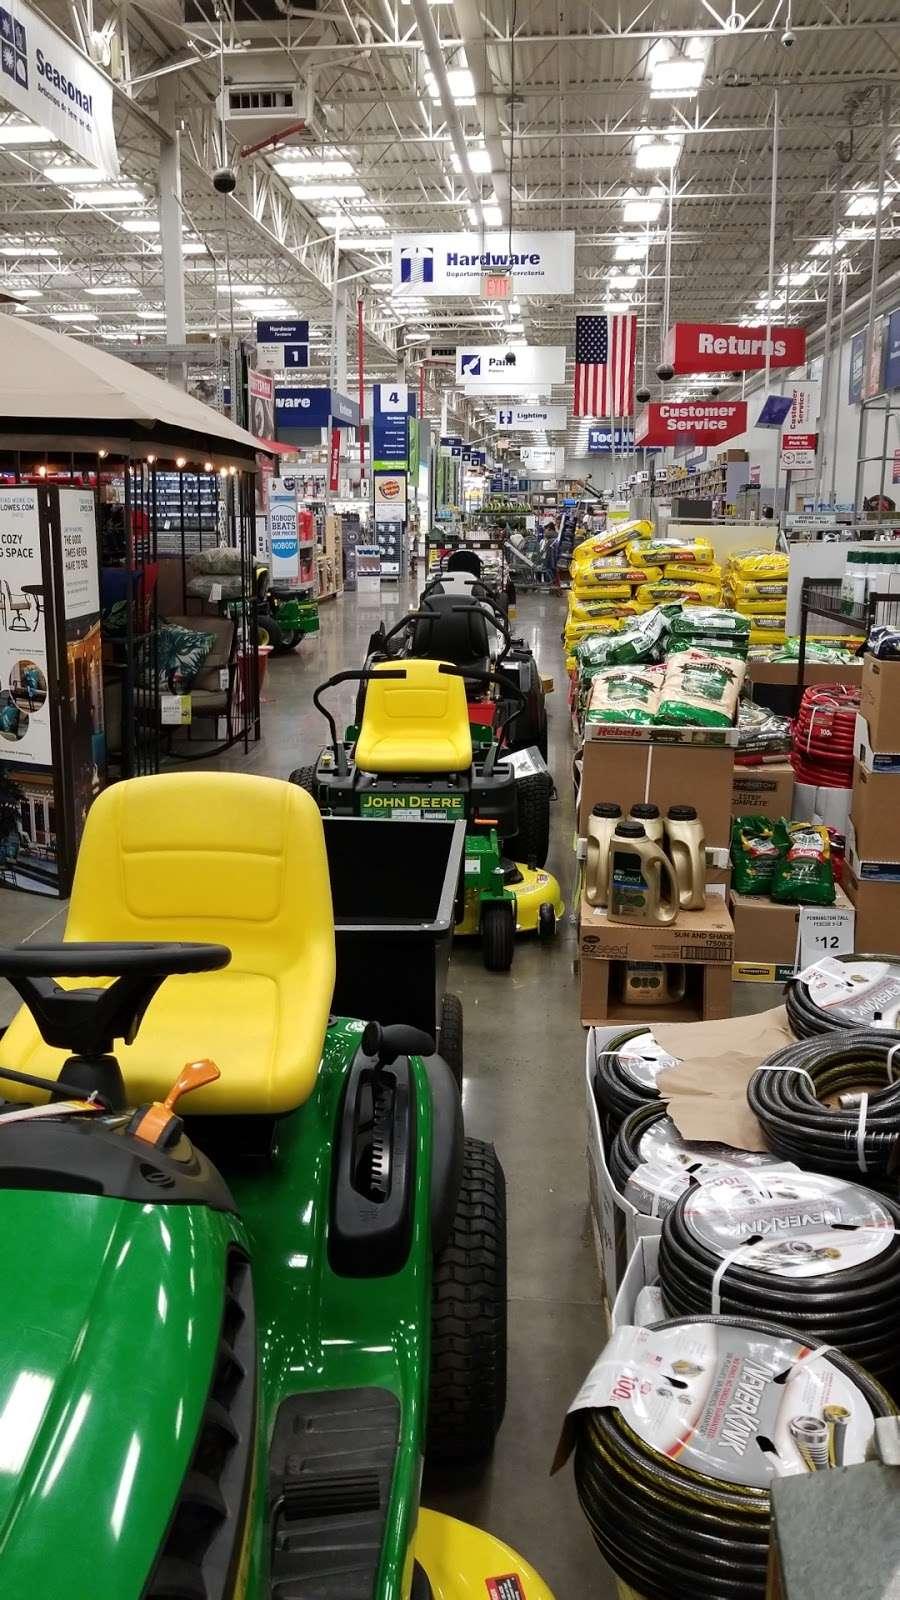 Lowes Home Improvement - hardware store    Photo 10 of 10   Address: 6920 State Ave, Kansas City, KS 66102, USA   Phone: (913) 328-7170